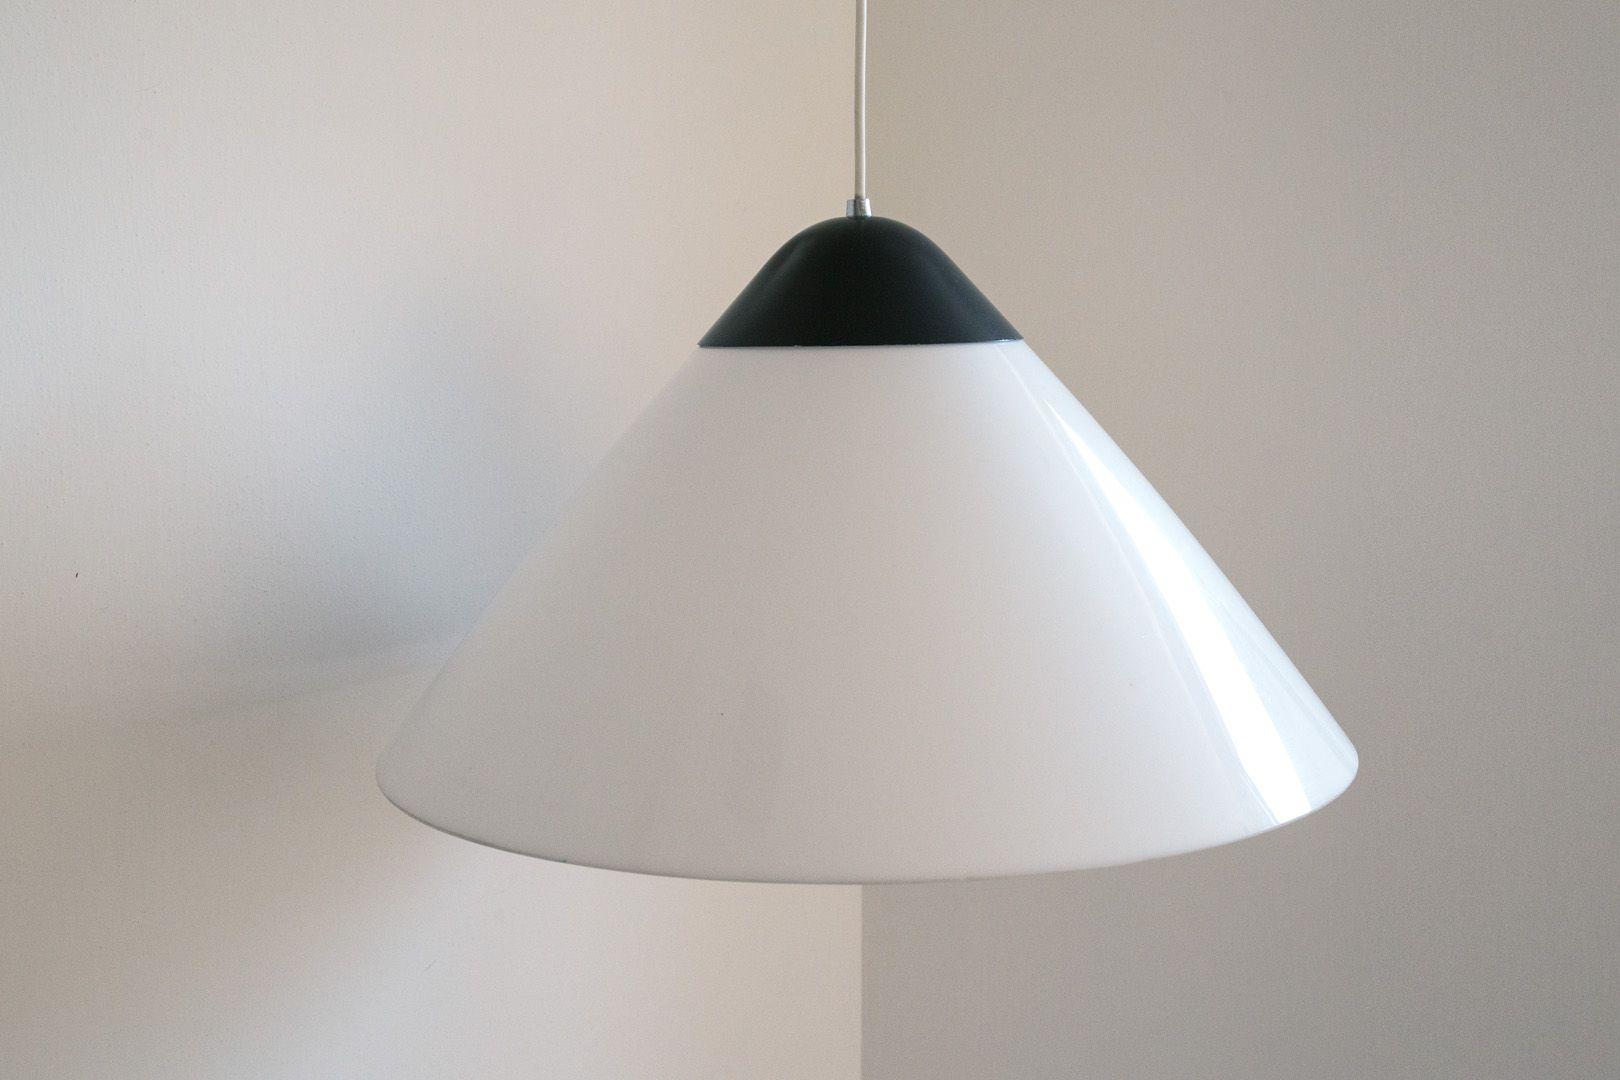 Scandinavian opala ceiling light by hans j wegner for sale at pamono scandinavian opala ceiling light by hans j wegner arubaitofo Images